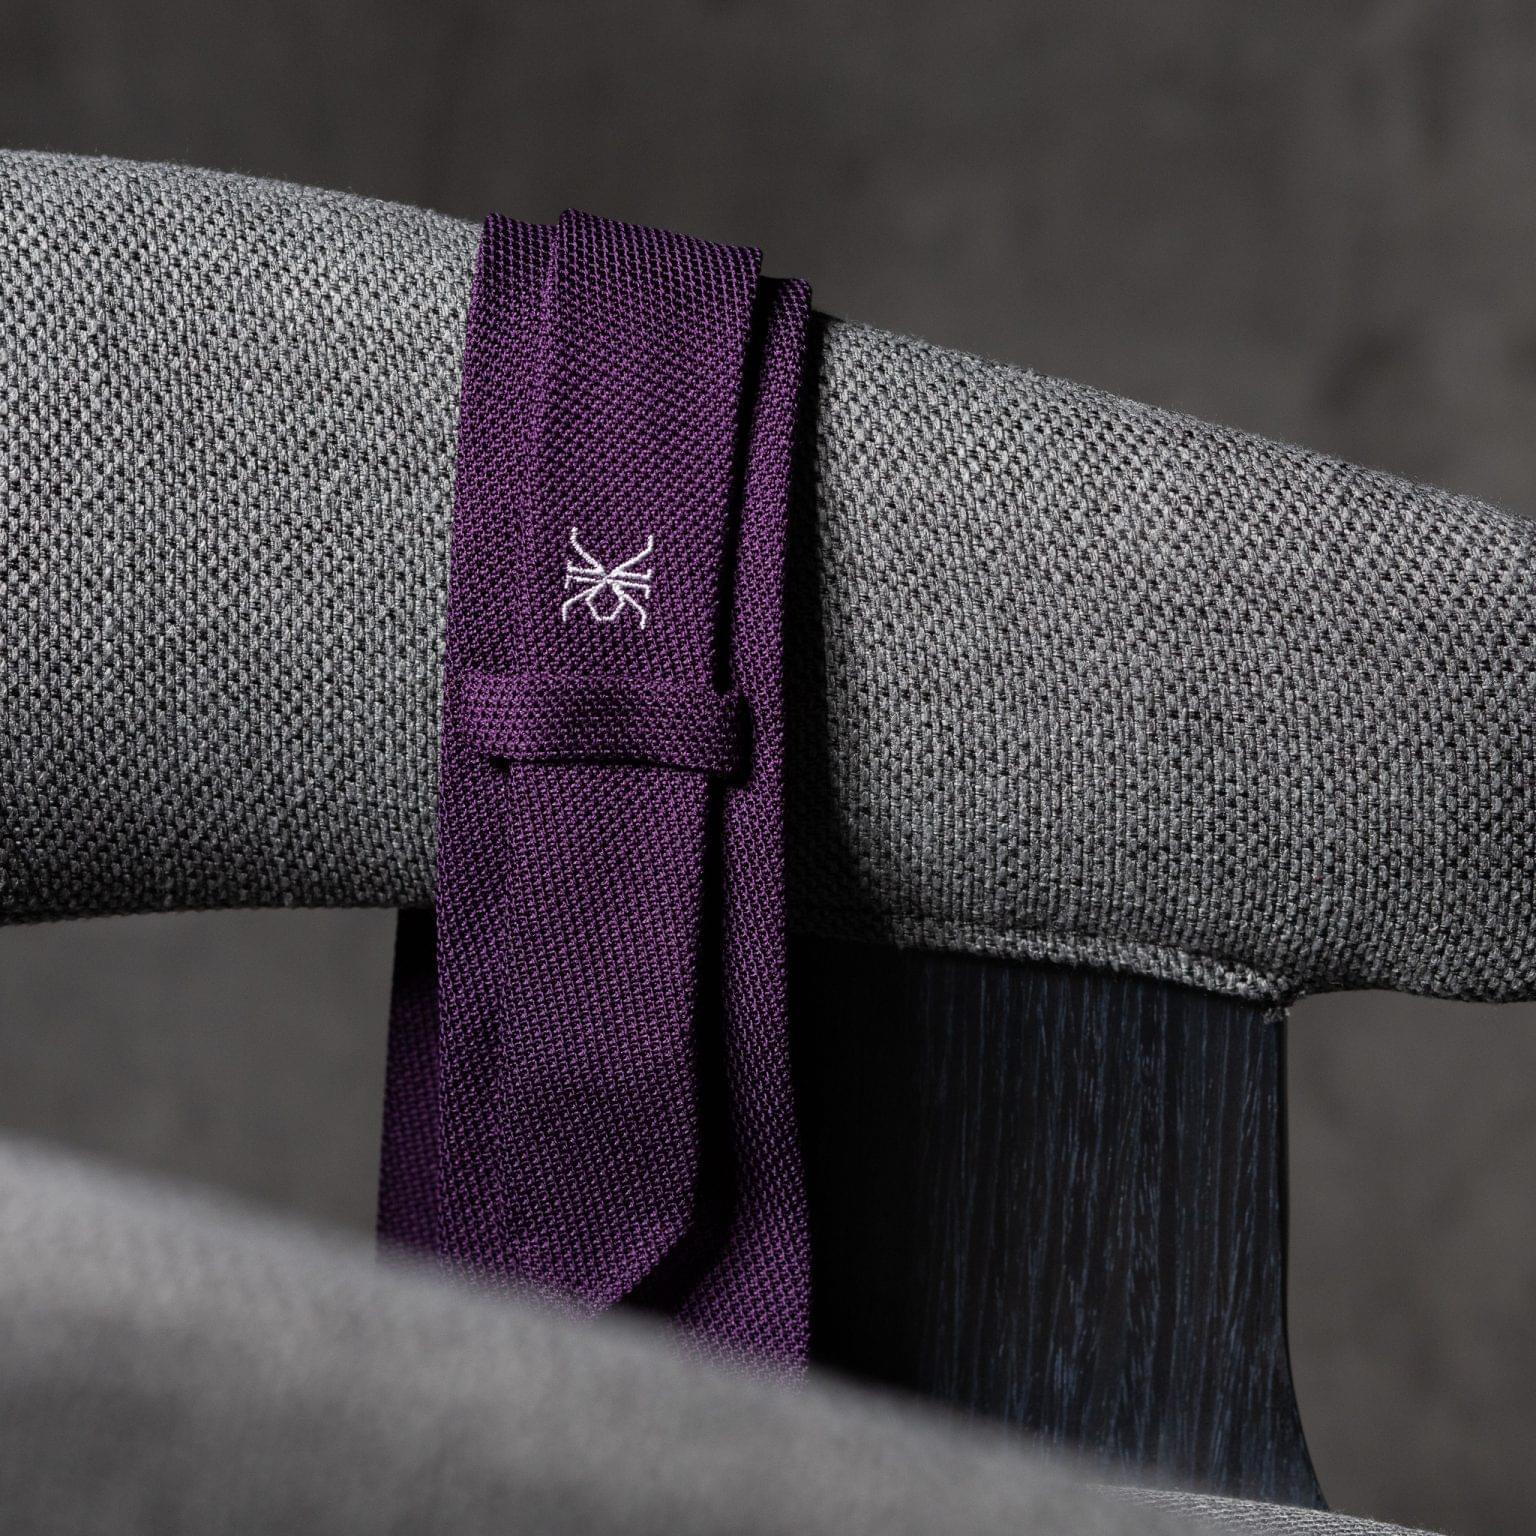 GRENADINE-0157-Tie-Initials-Corbata-Iniciales-The-Seelk-4